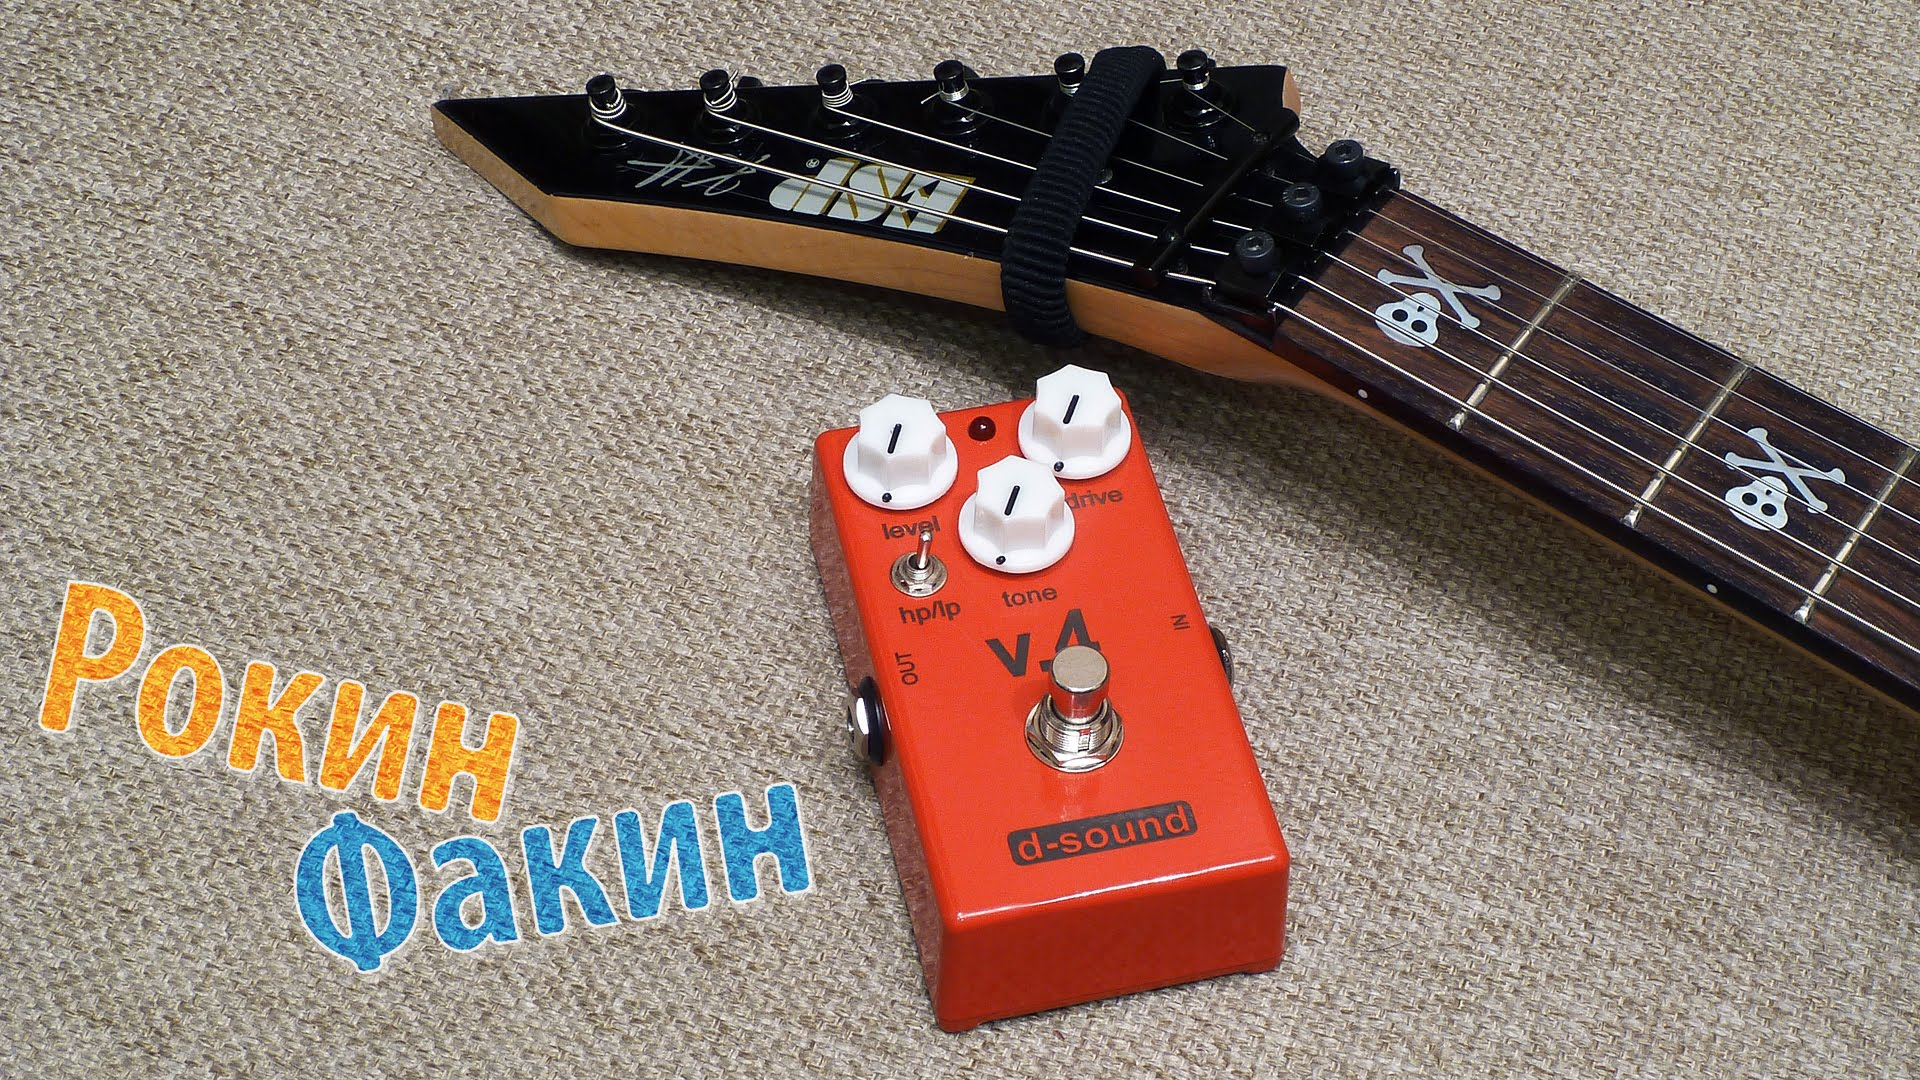 Рокин Факин 46 - D-Sound V.4 (Россия)